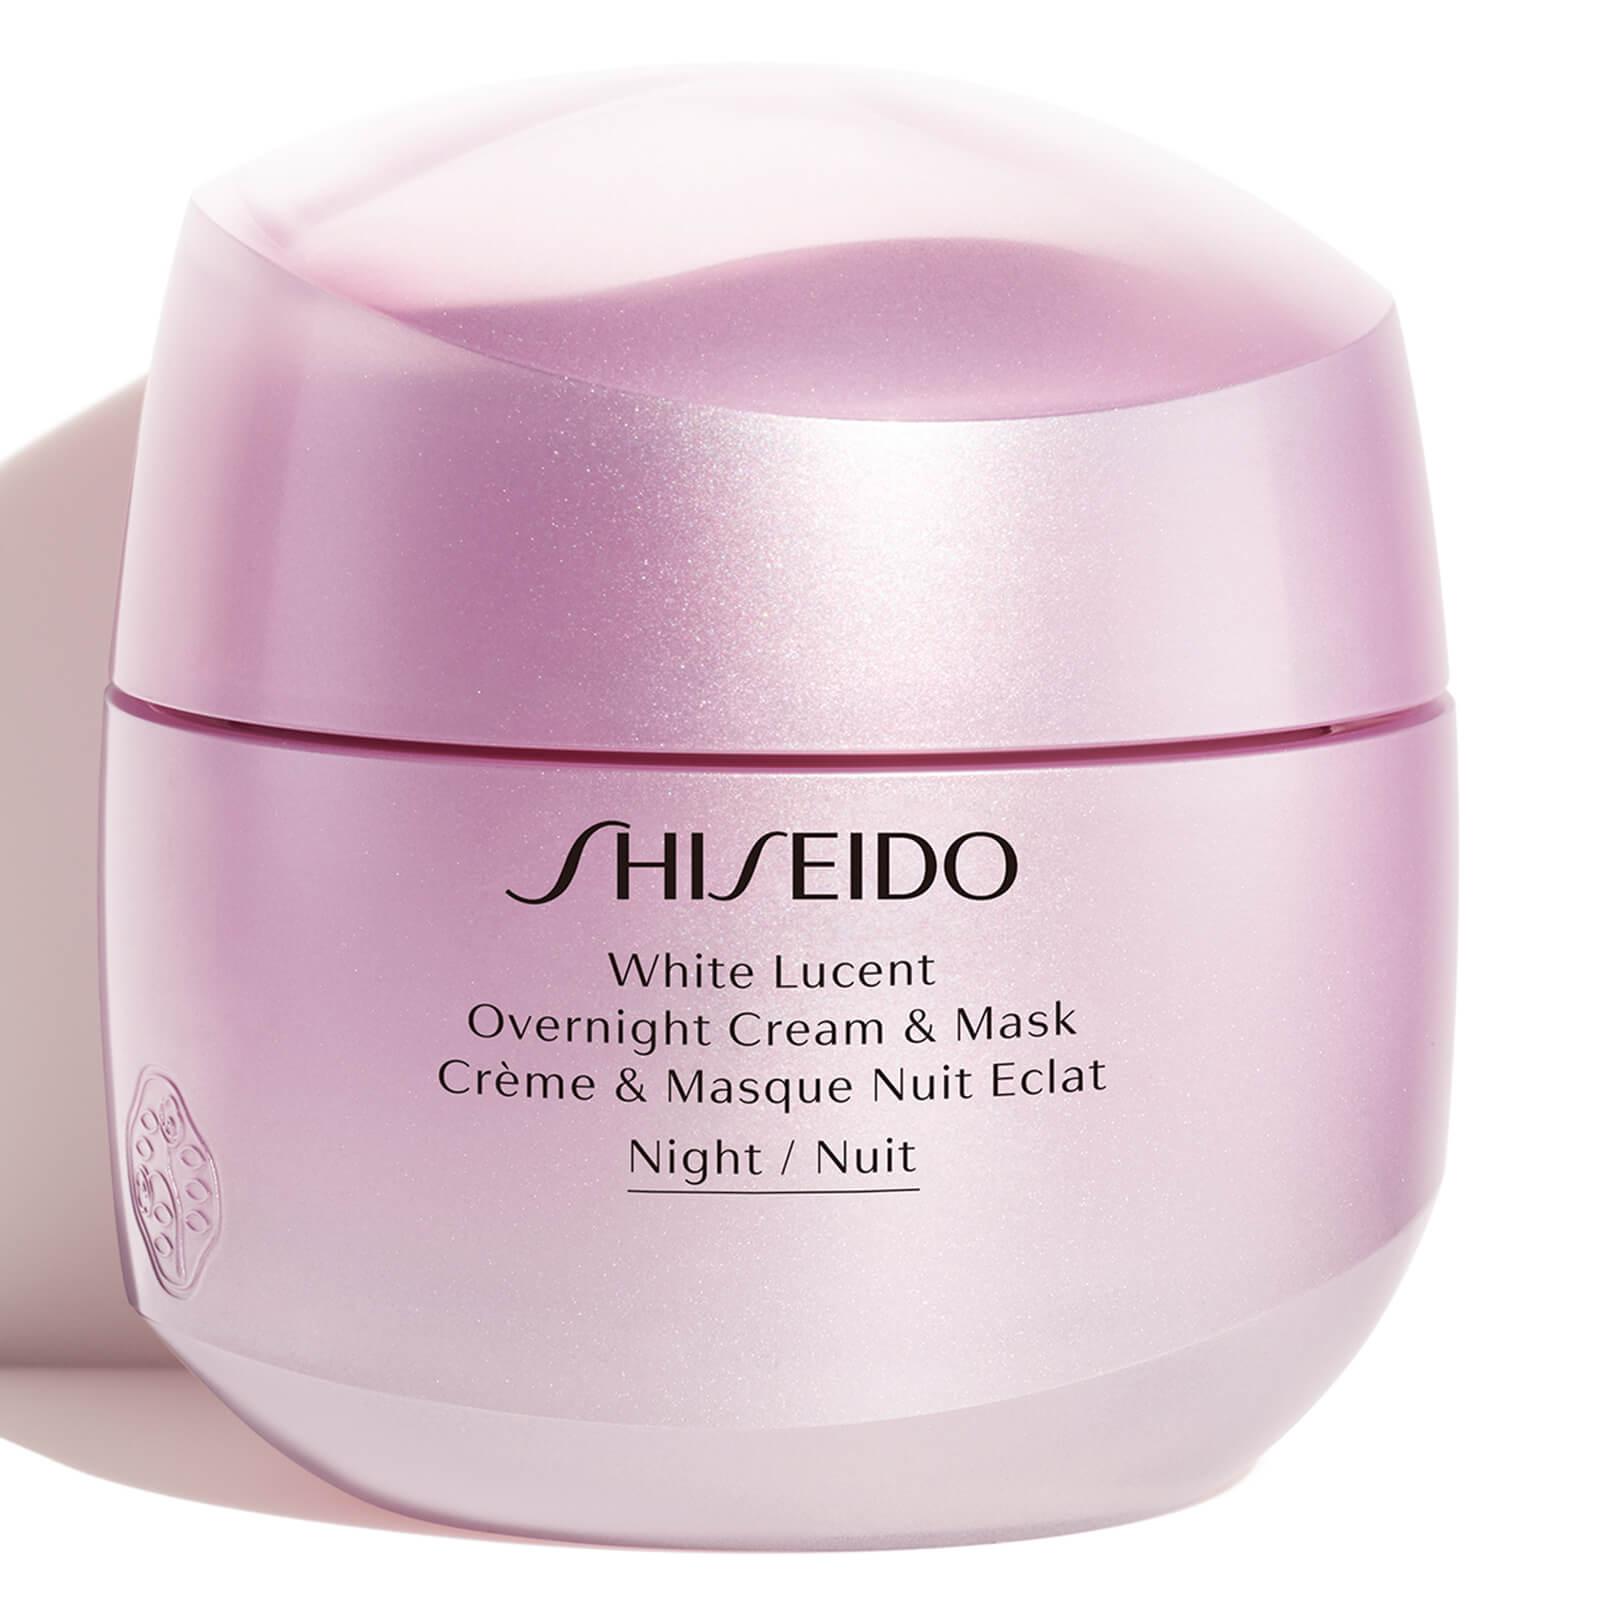 Shiseido White Lucent Overnight Cream and Mask 75ml